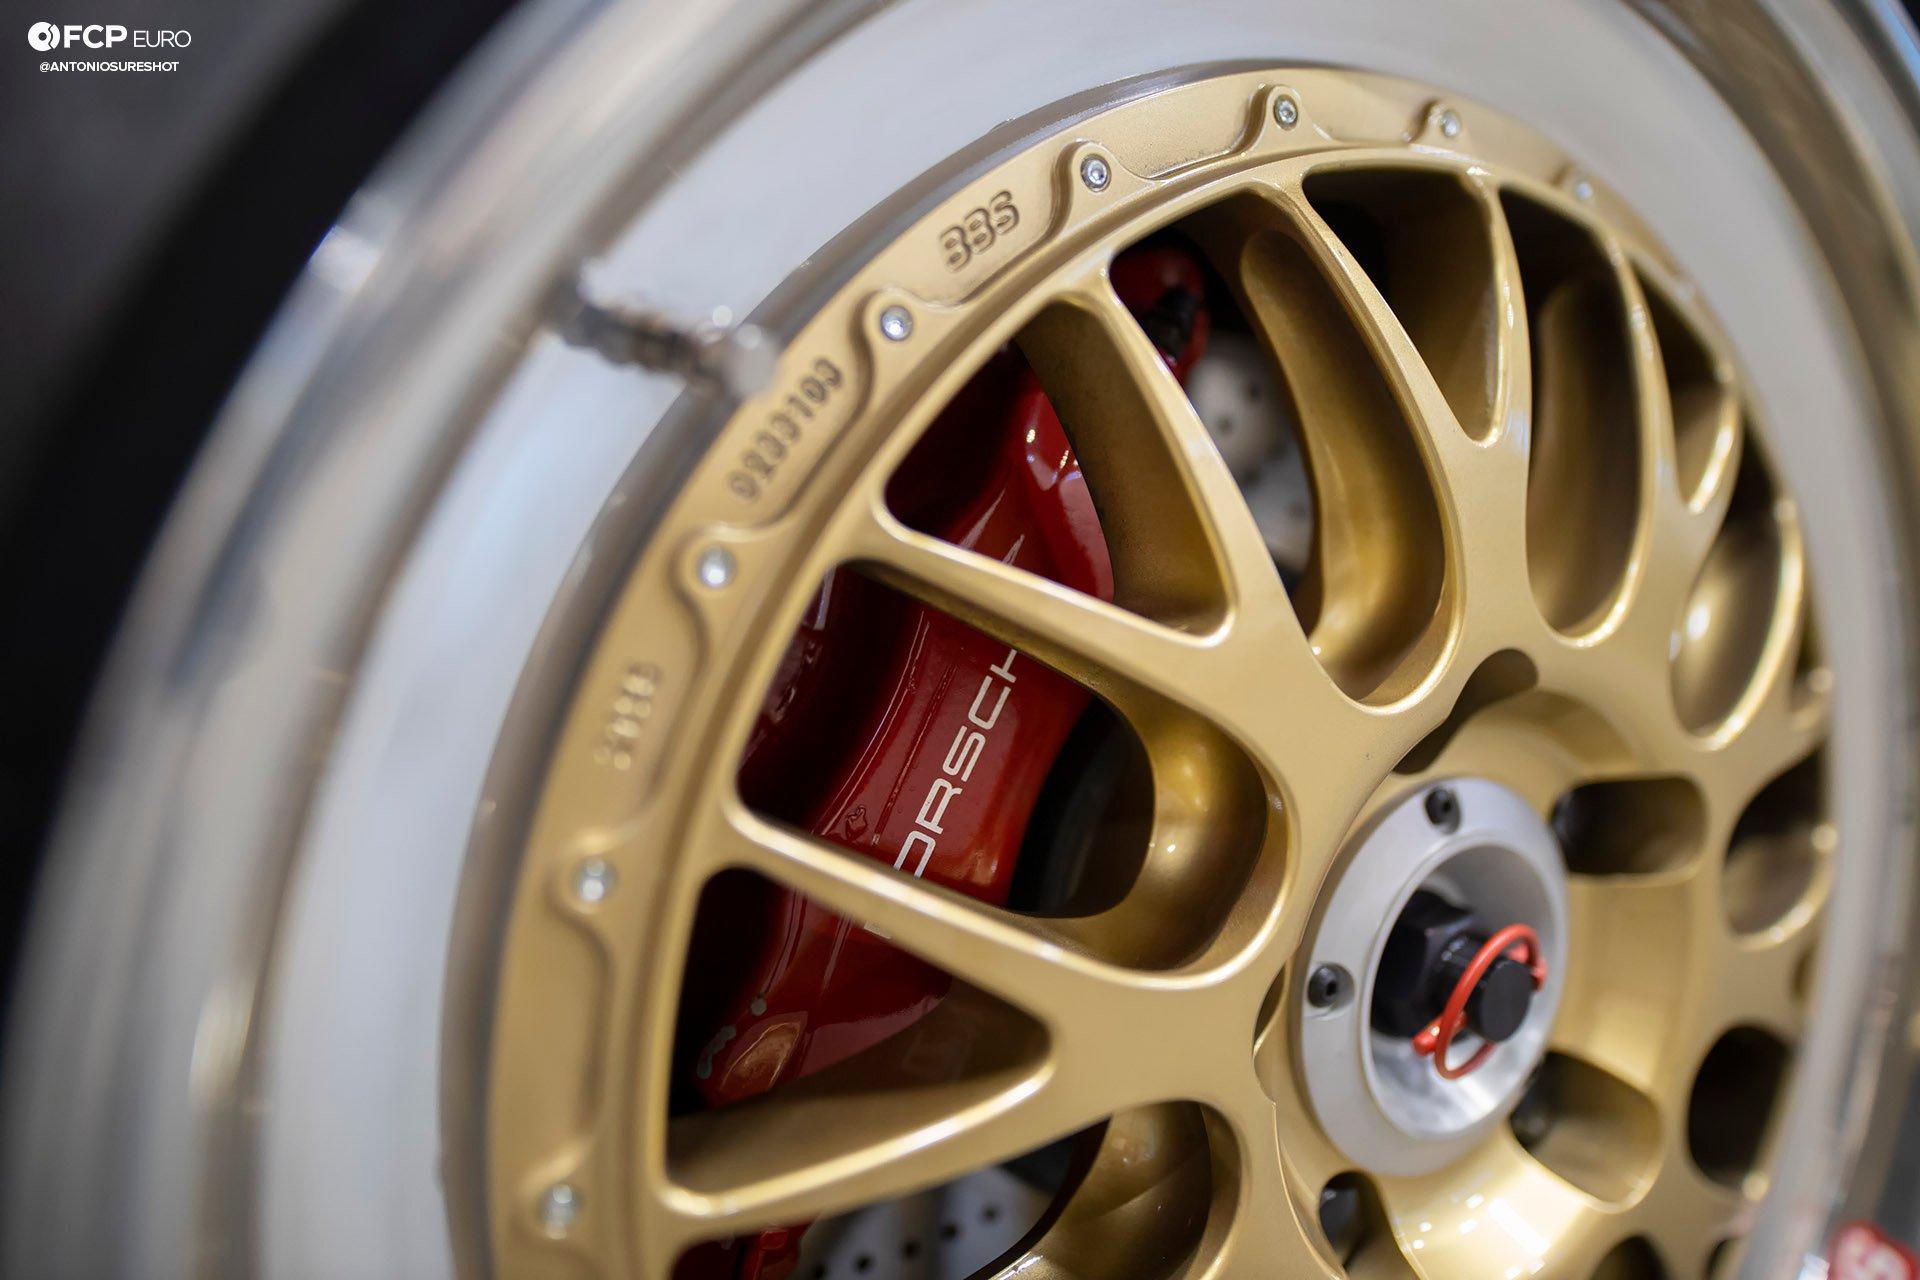 Zuffenhausen 993 Porsche 911 BBS Wheels Recaro EOSR9569